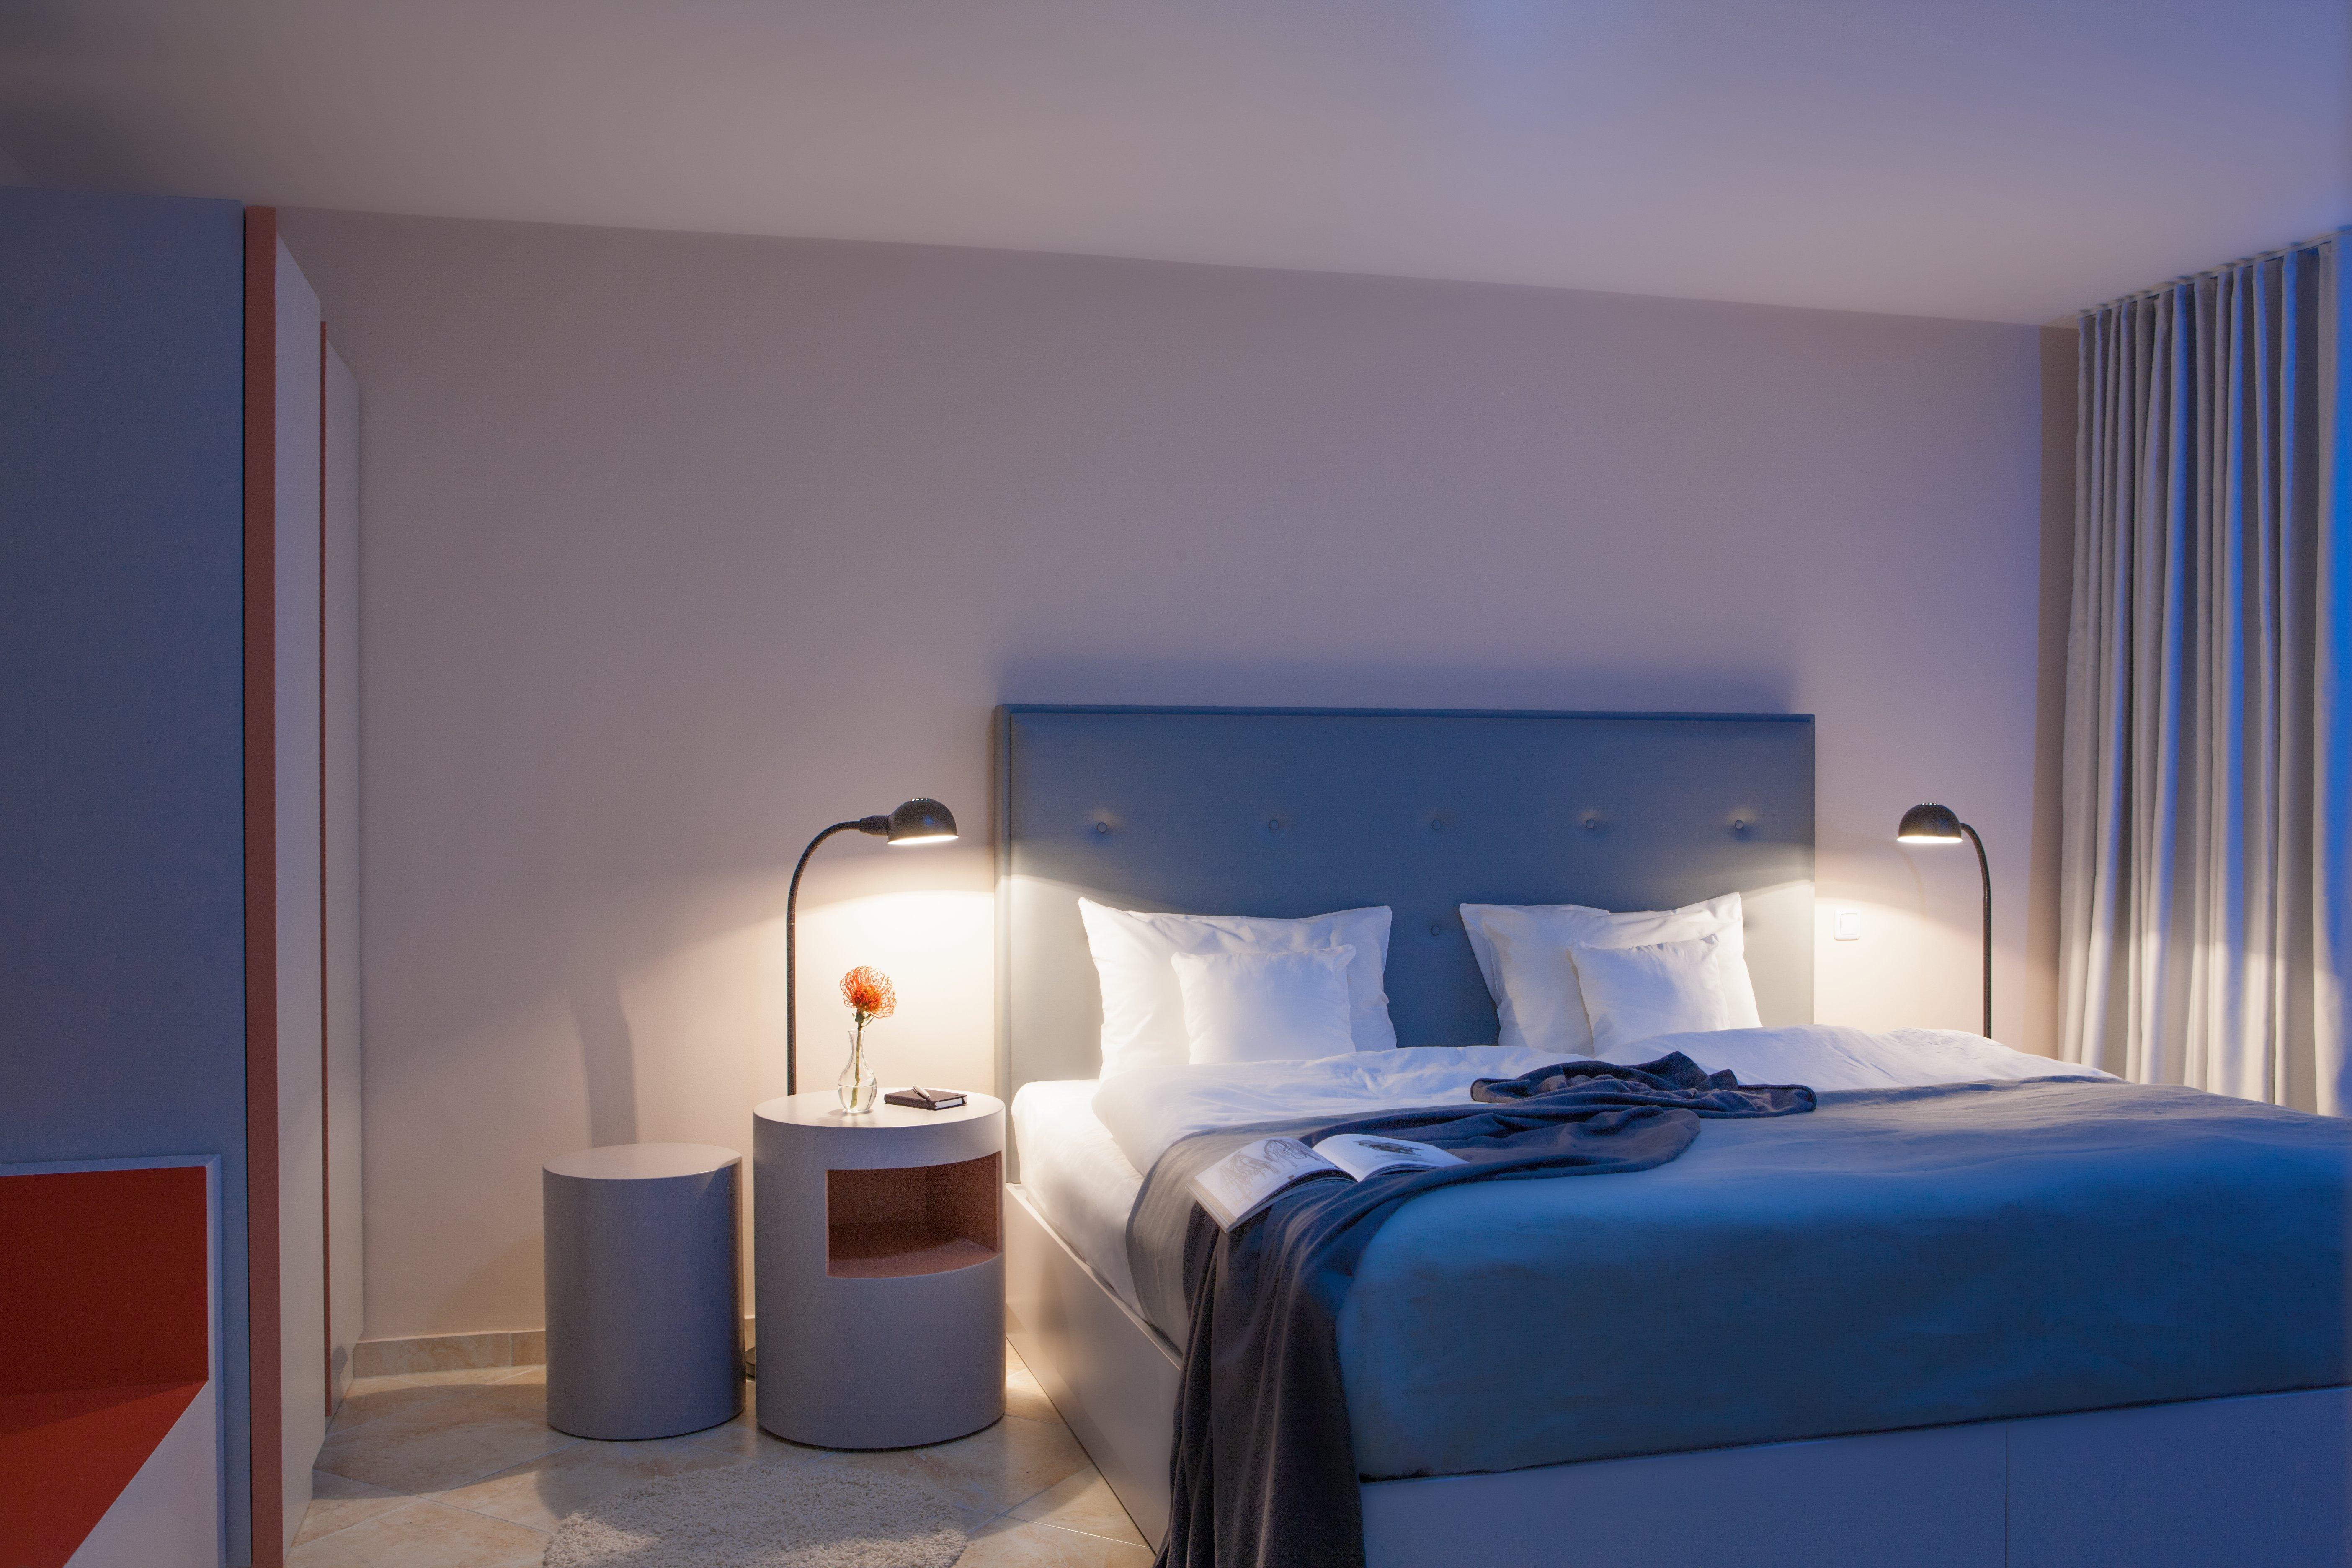 pensionen in dortmund in vebidoobiz finden. Black Bedroom Furniture Sets. Home Design Ideas